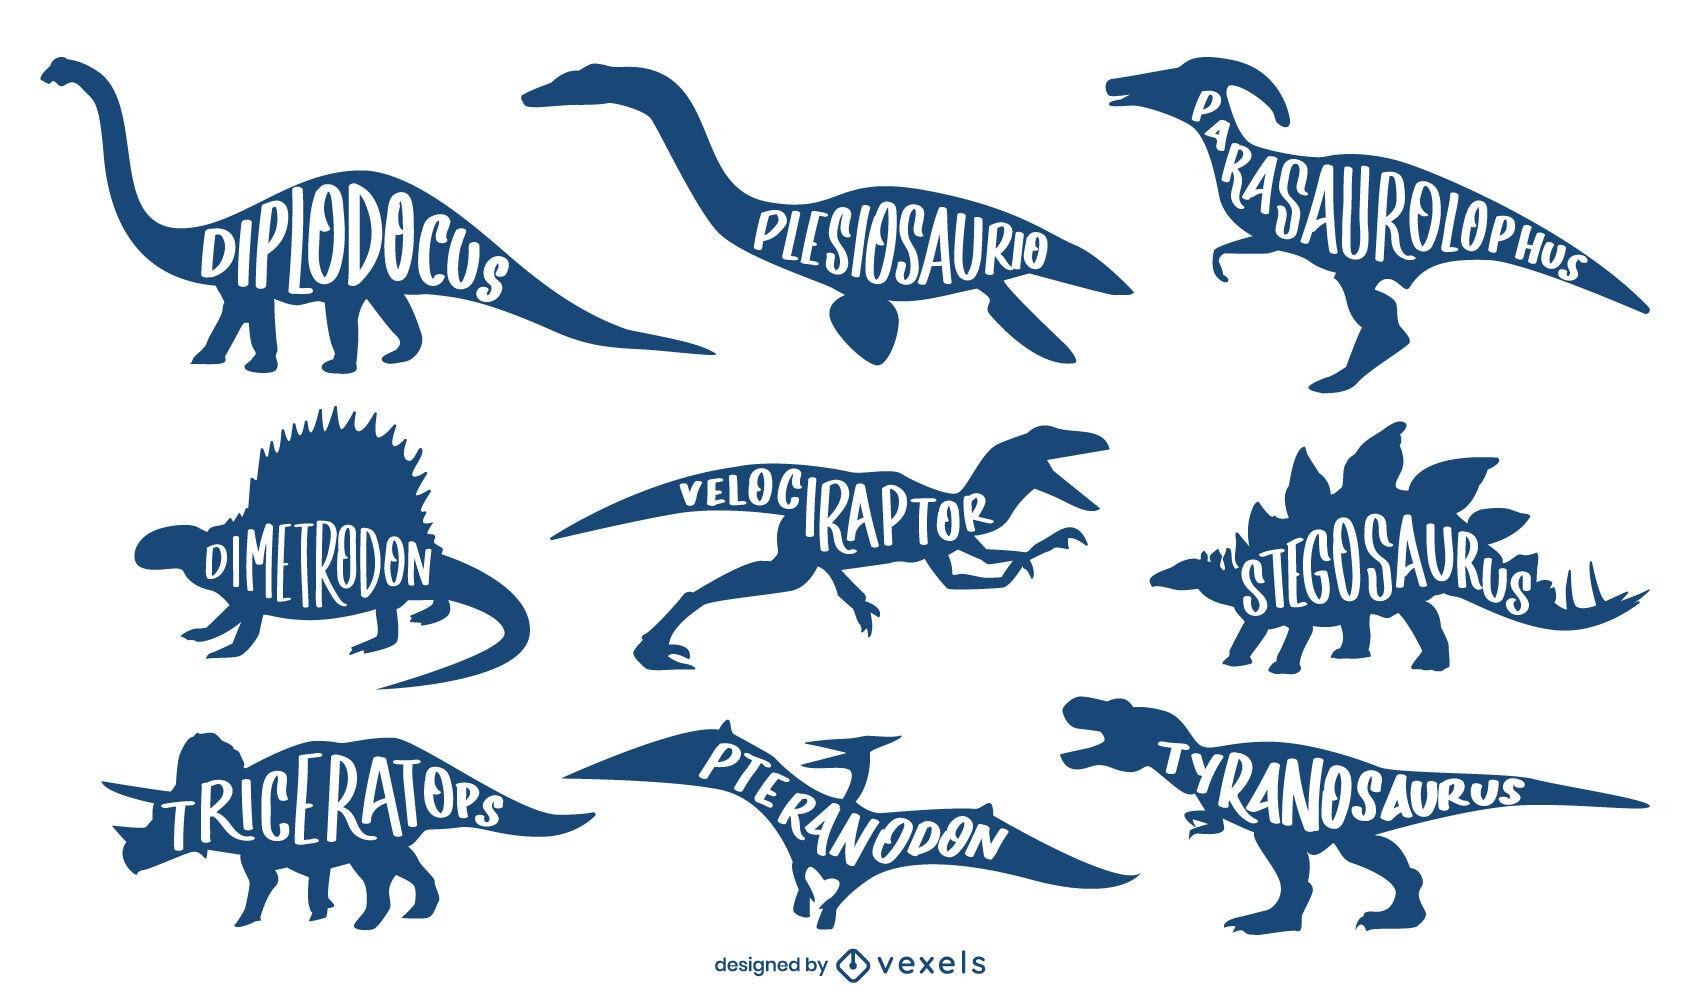 Dinosaur silhouettes animal names set